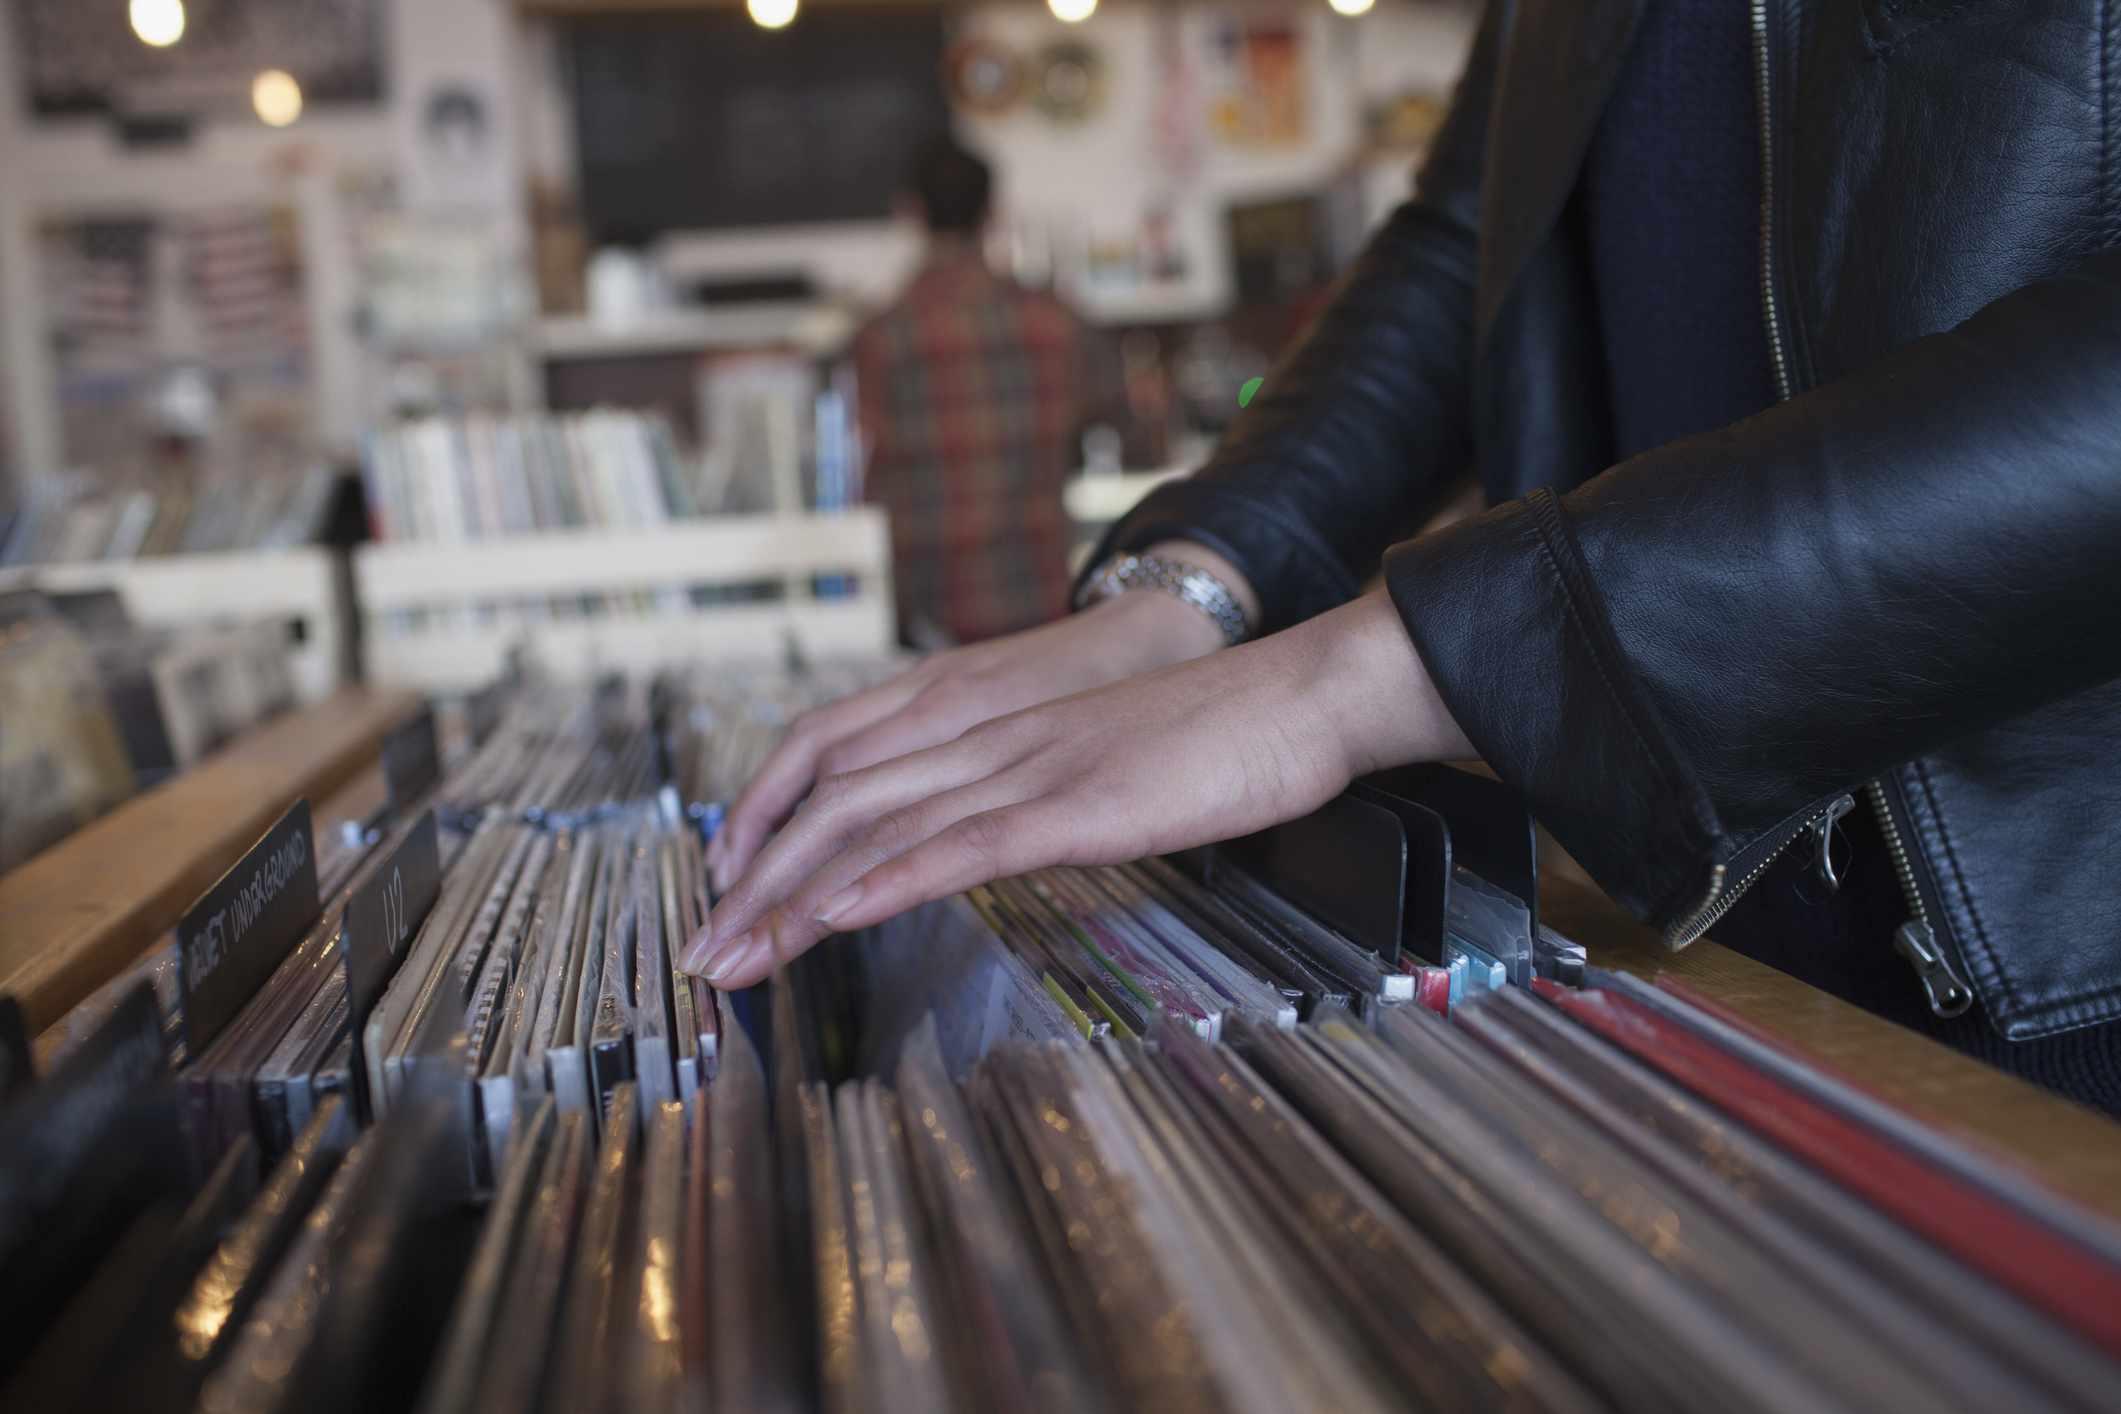 Hands rifle through vinyl records